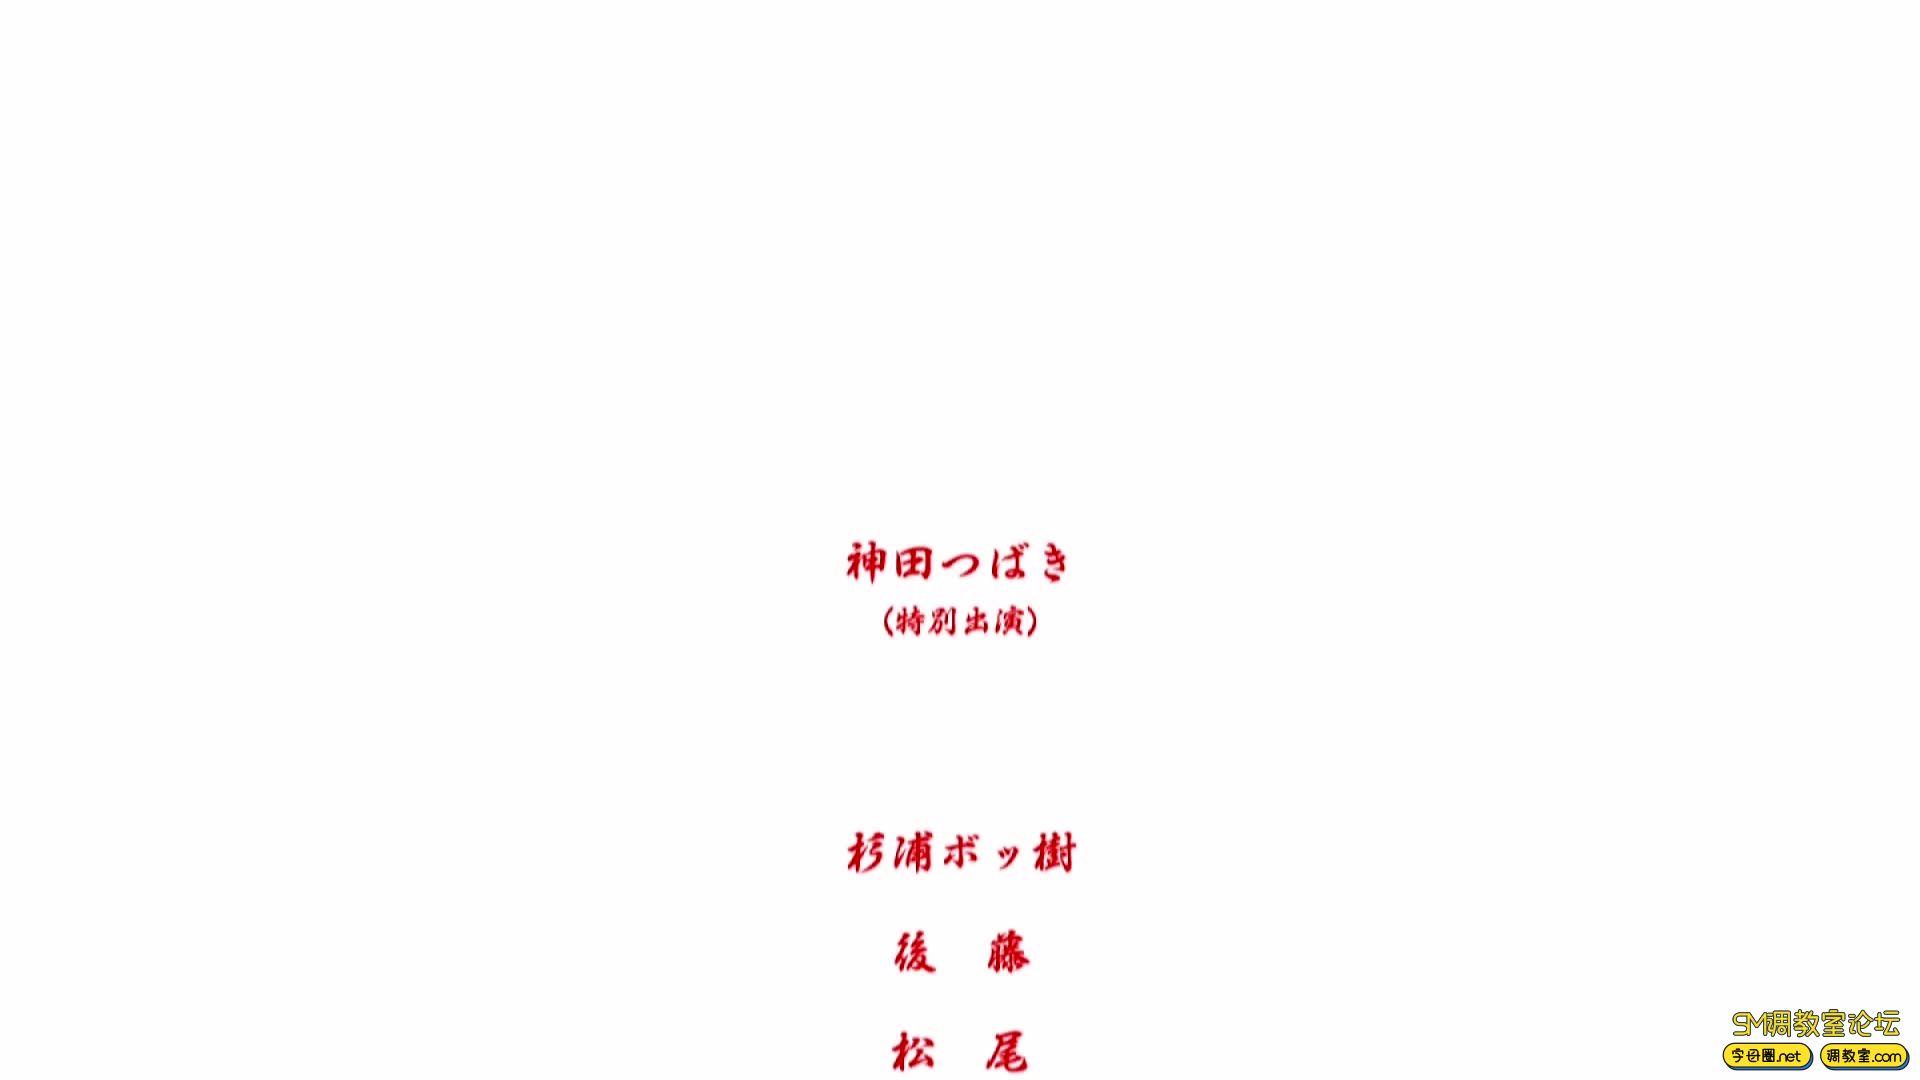 [Dogma合集] - NTJ-004 - 穴奴隷介護士 樹花凜-视频截图8